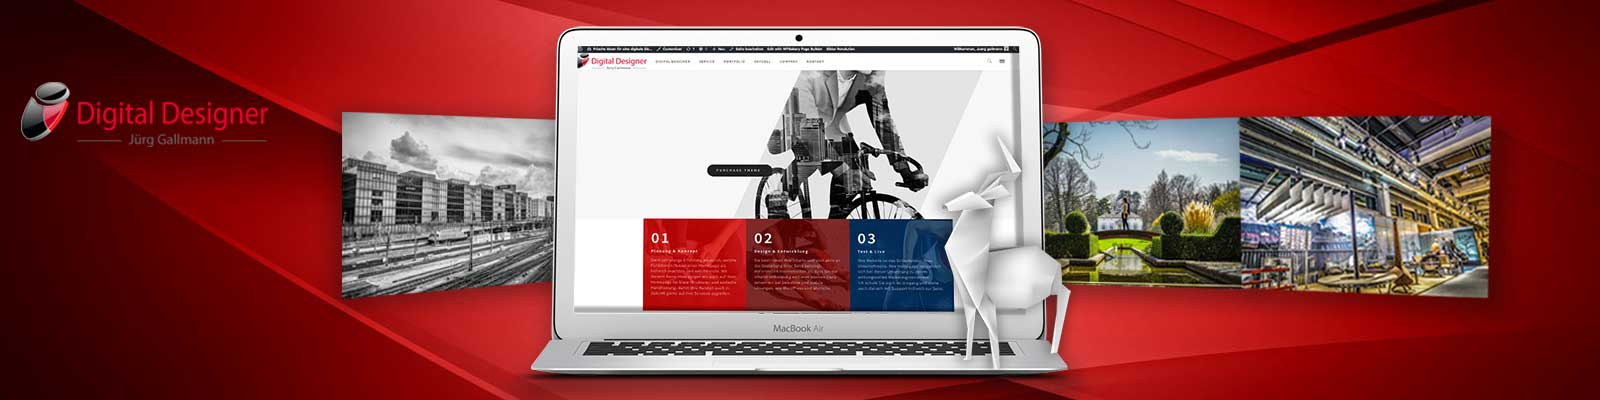 Digital-designer-juerg-gallmann-background-Social-media-1600x400-move